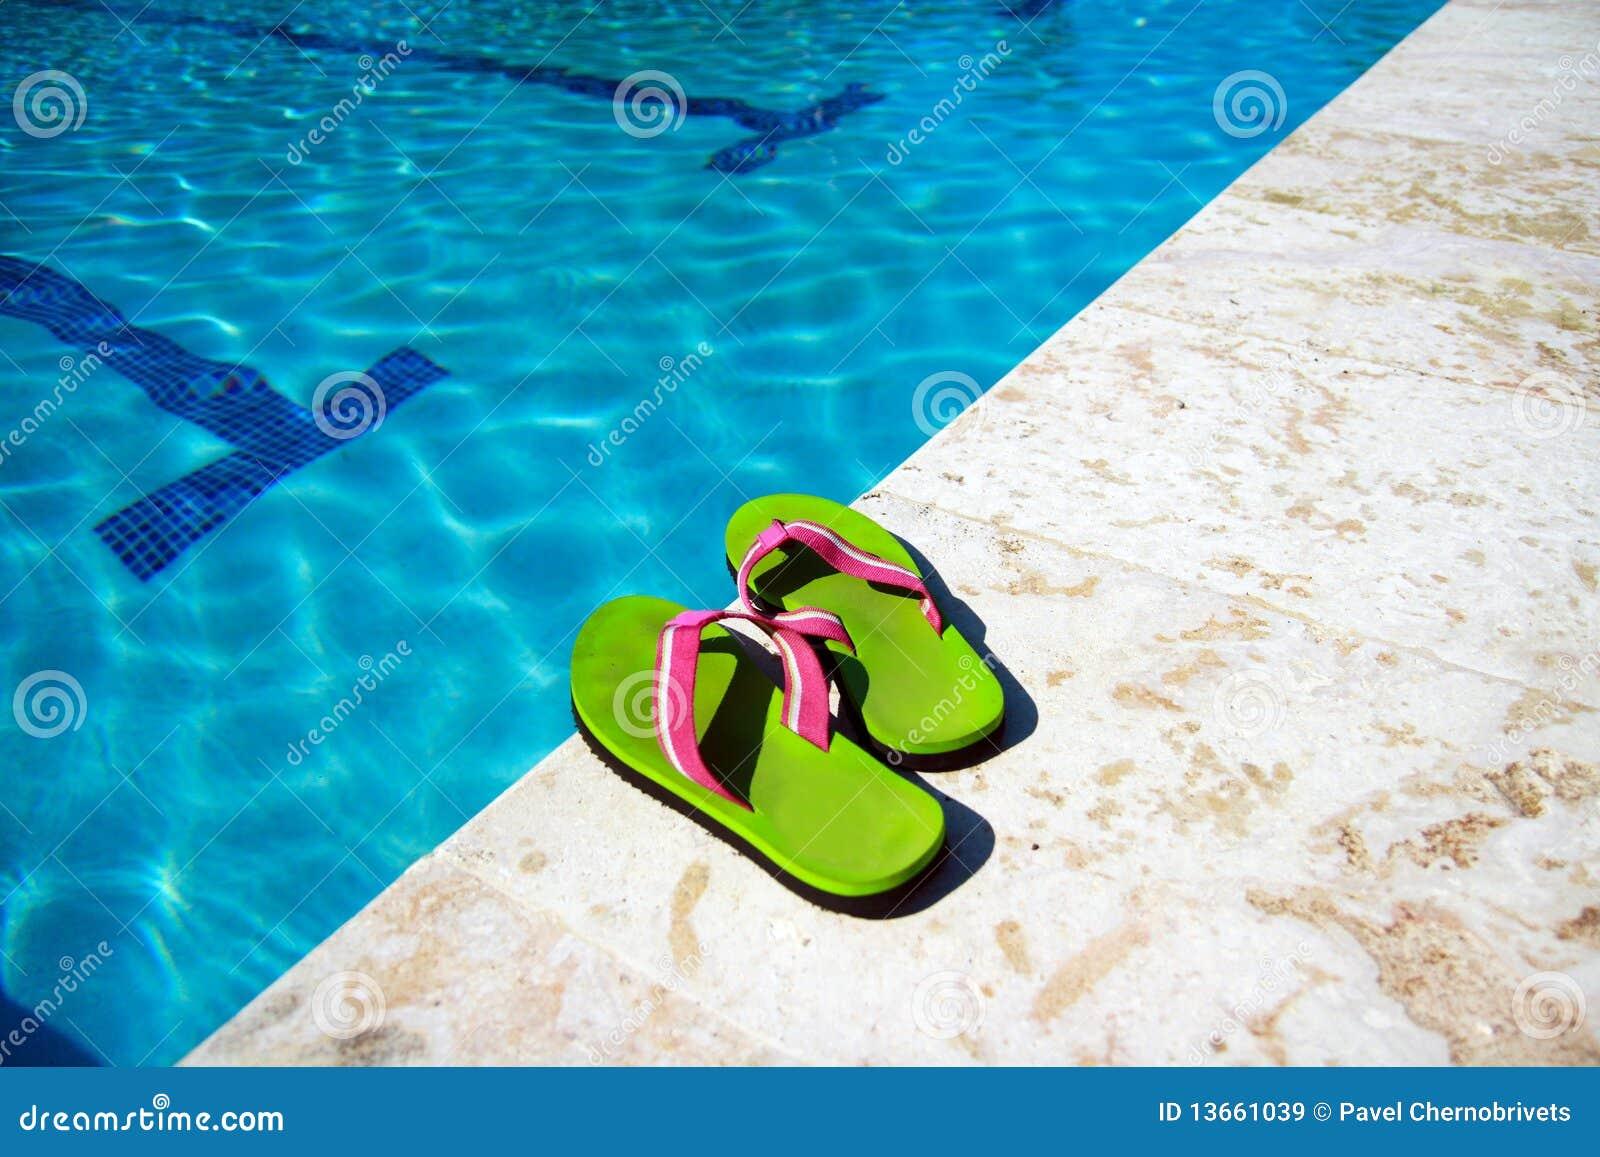 Los deslizadores acercan a la piscina - Business plan piscina ...